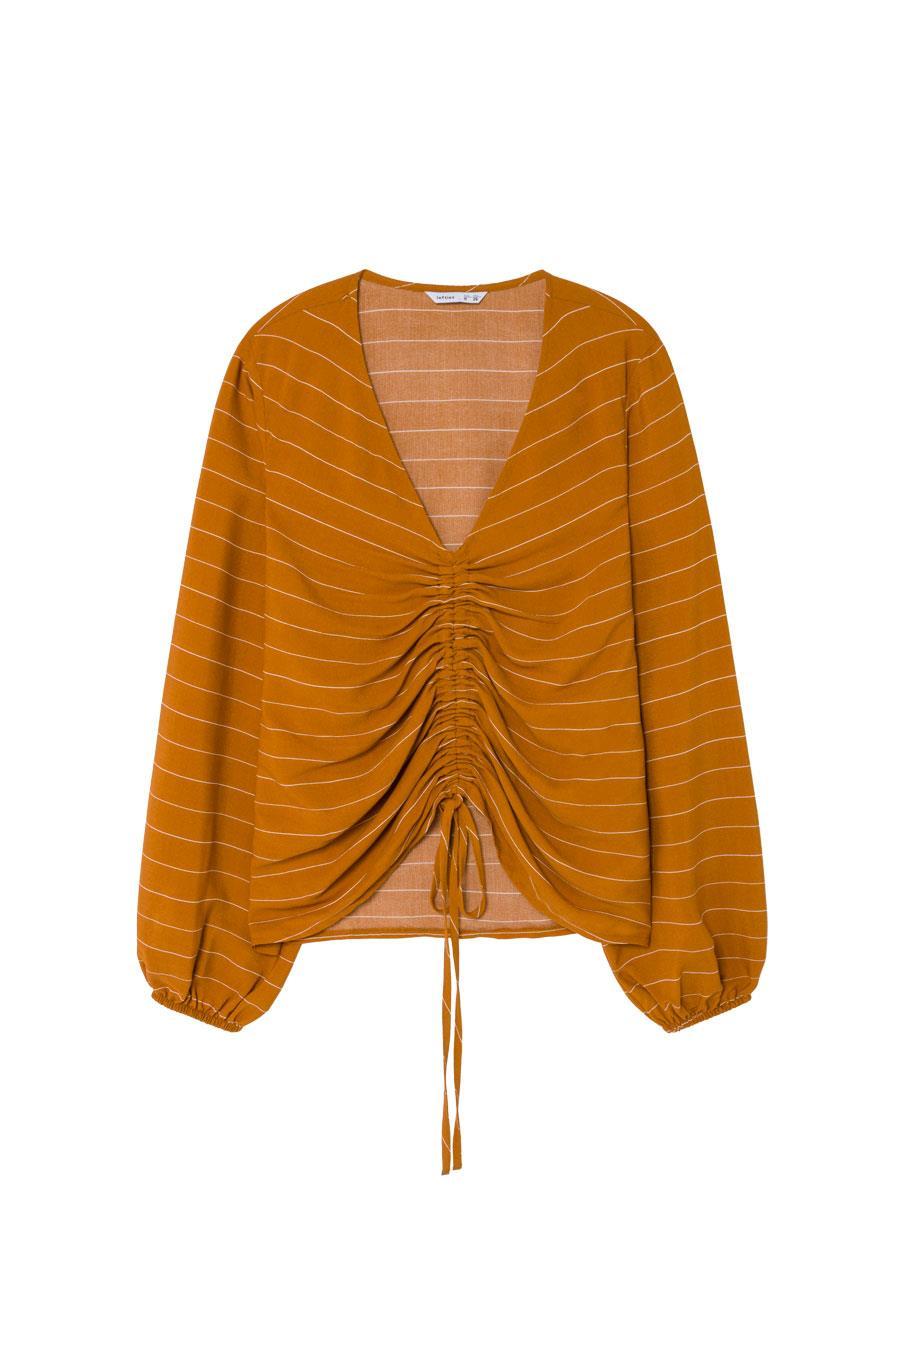 aedcca64e4af Lefties mujer  tendencias de moda primavera-verano 2019 - InStyle